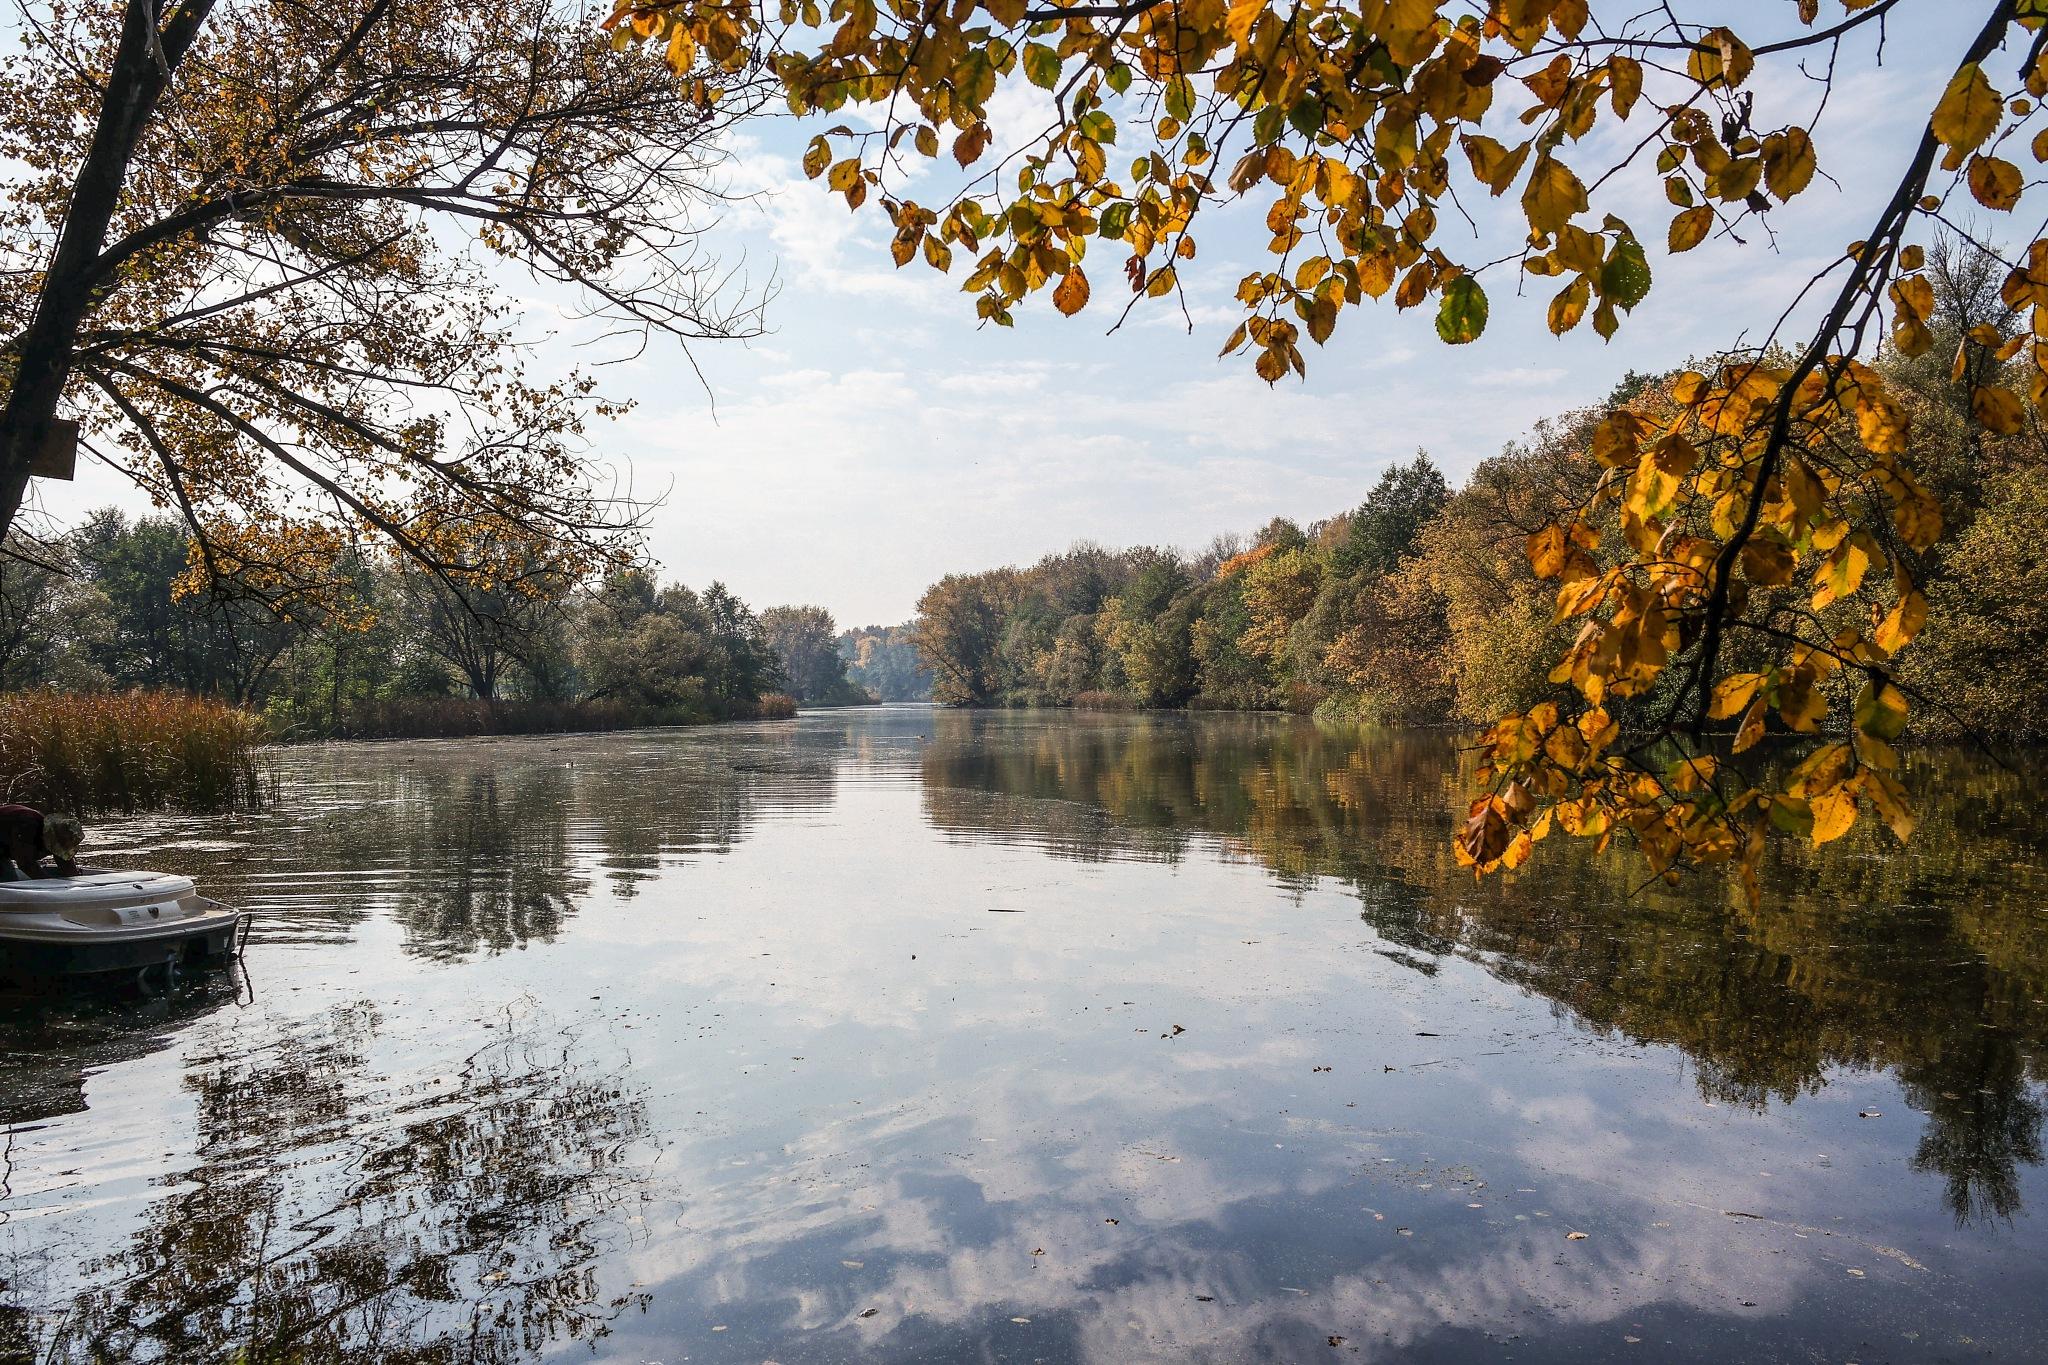 Golden autumn. by Alexandr  Seleznev